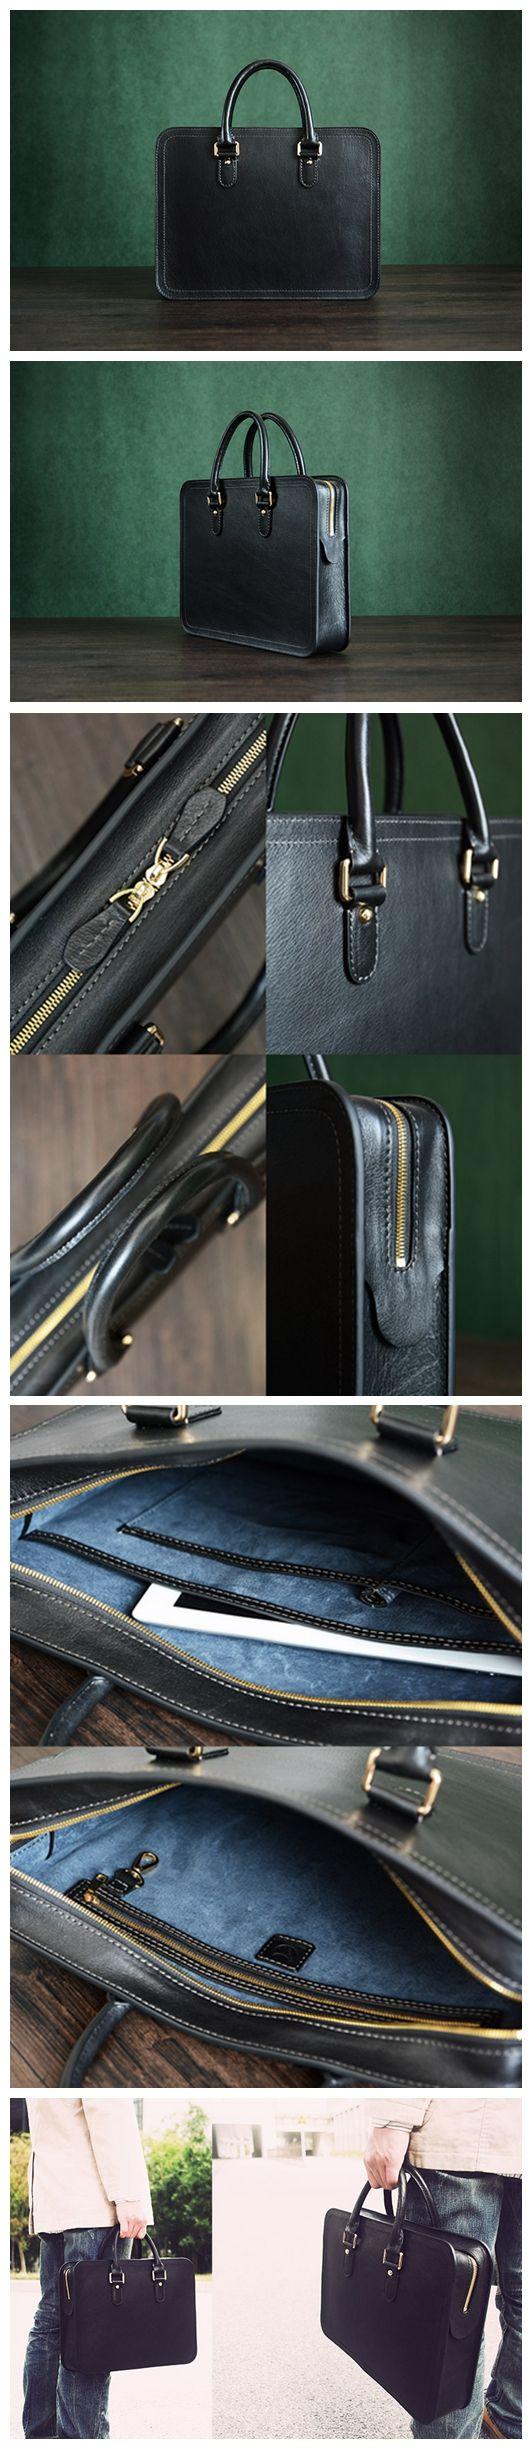 Custom Handmade Vegetable Tanned Italian Leather Briefcase Mens Handbag Business Laptop Bag